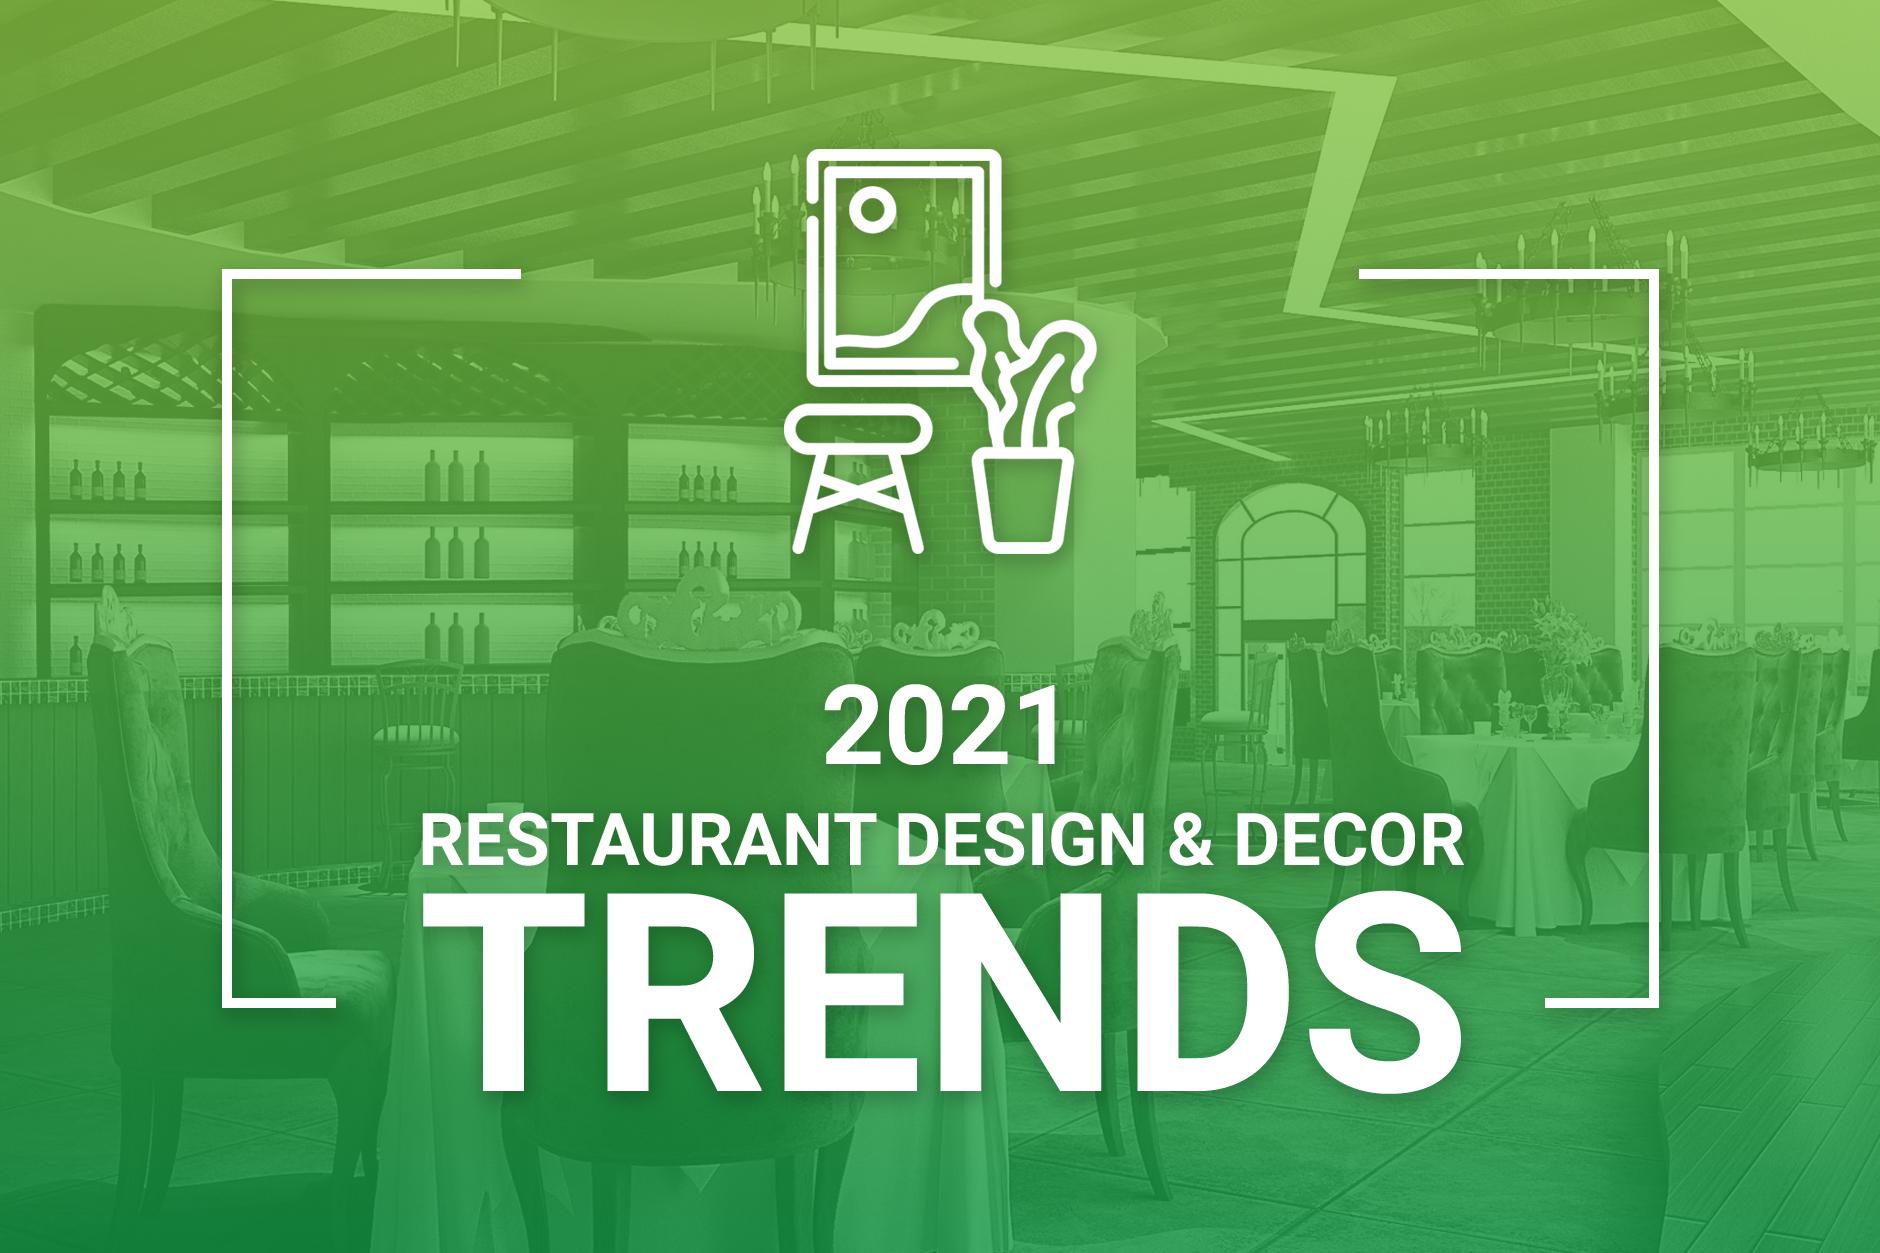 Restaurant Design Trends 2021